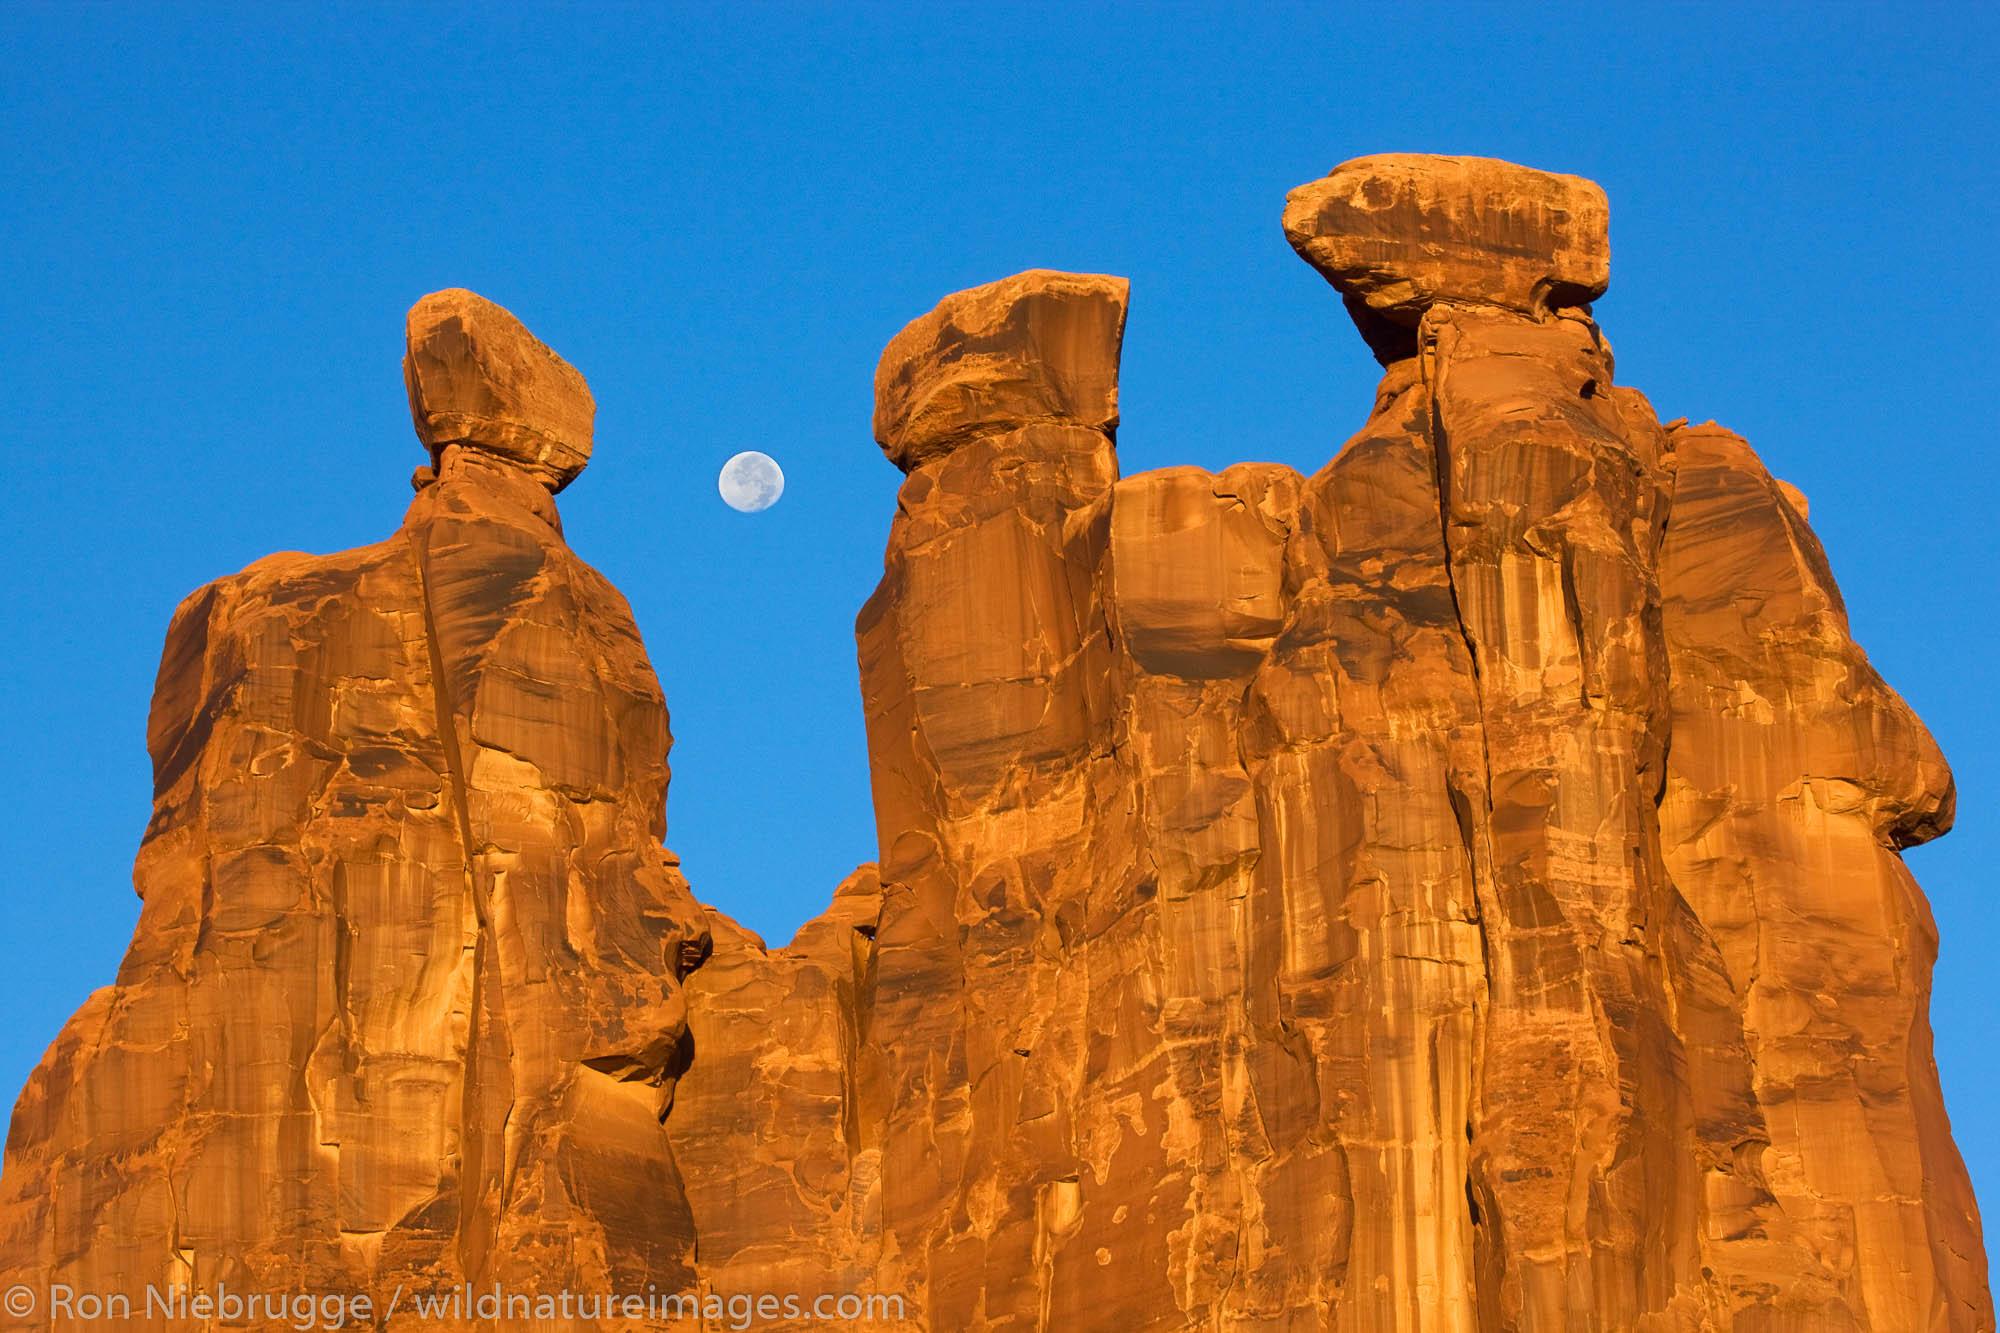 Near full moon along with the Three Gossips, Arches National Park, near Moab, Utah.